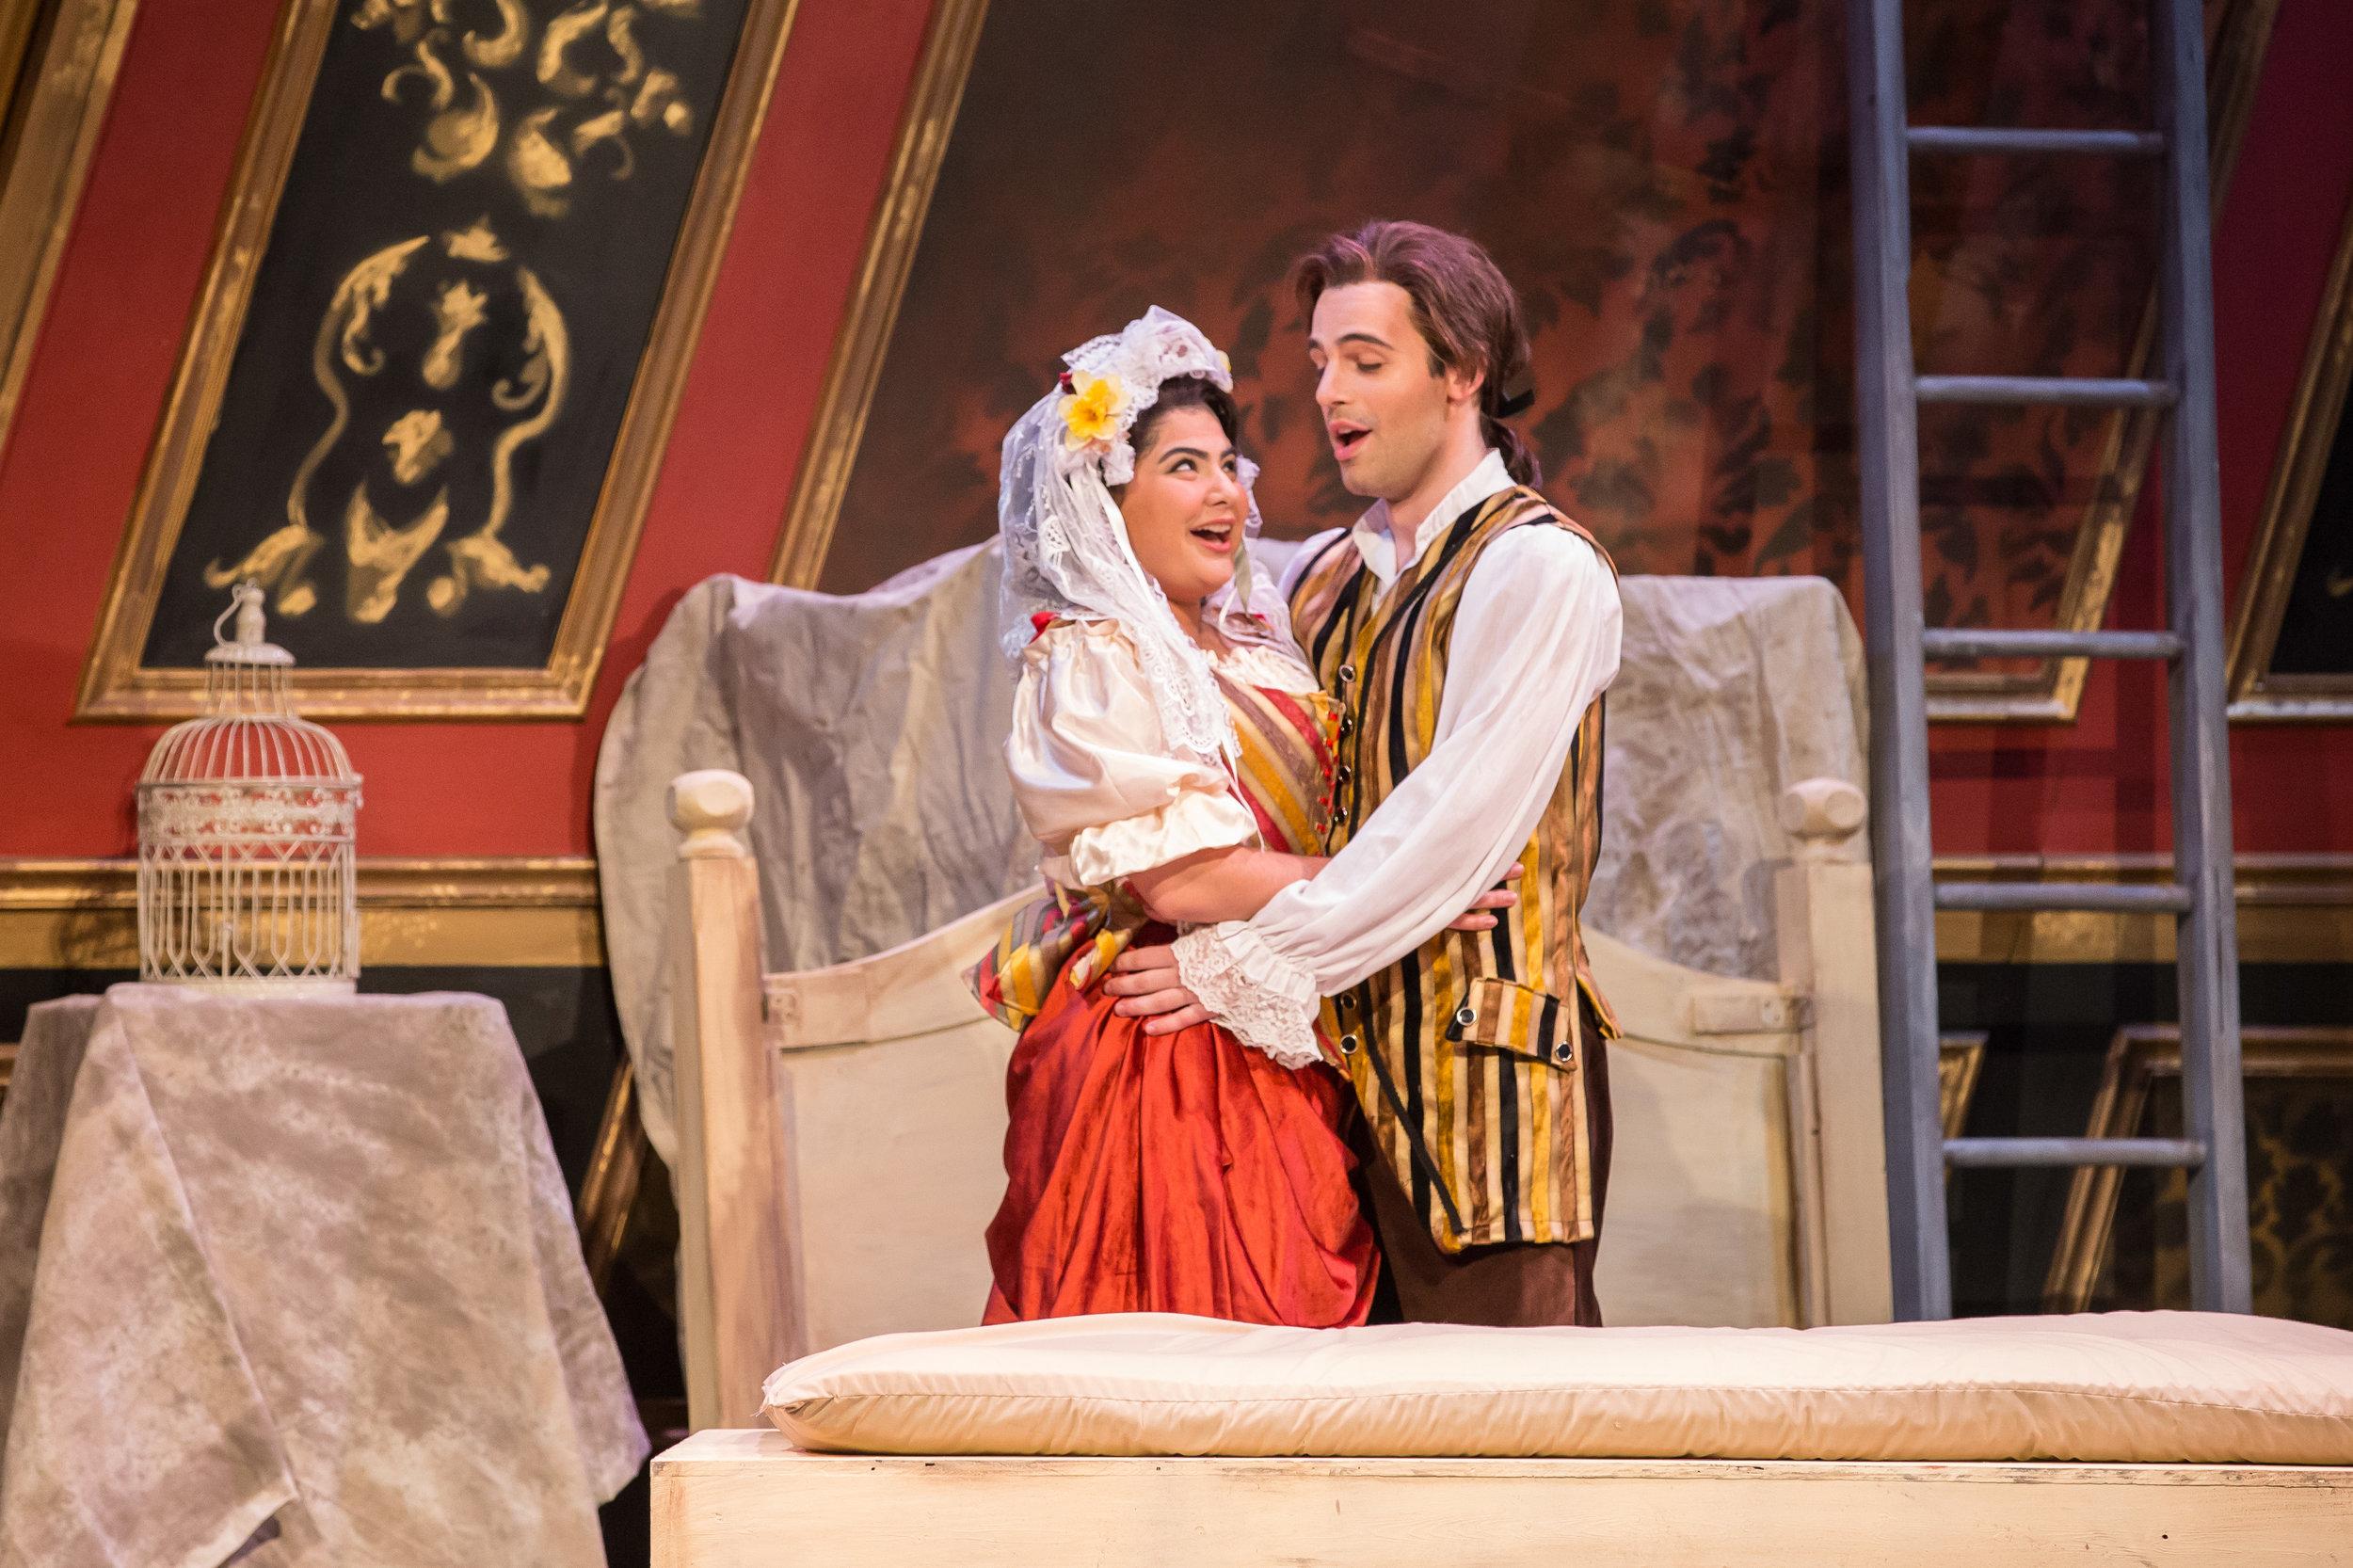 Marriage of Figaro, Northwestern University, 2016